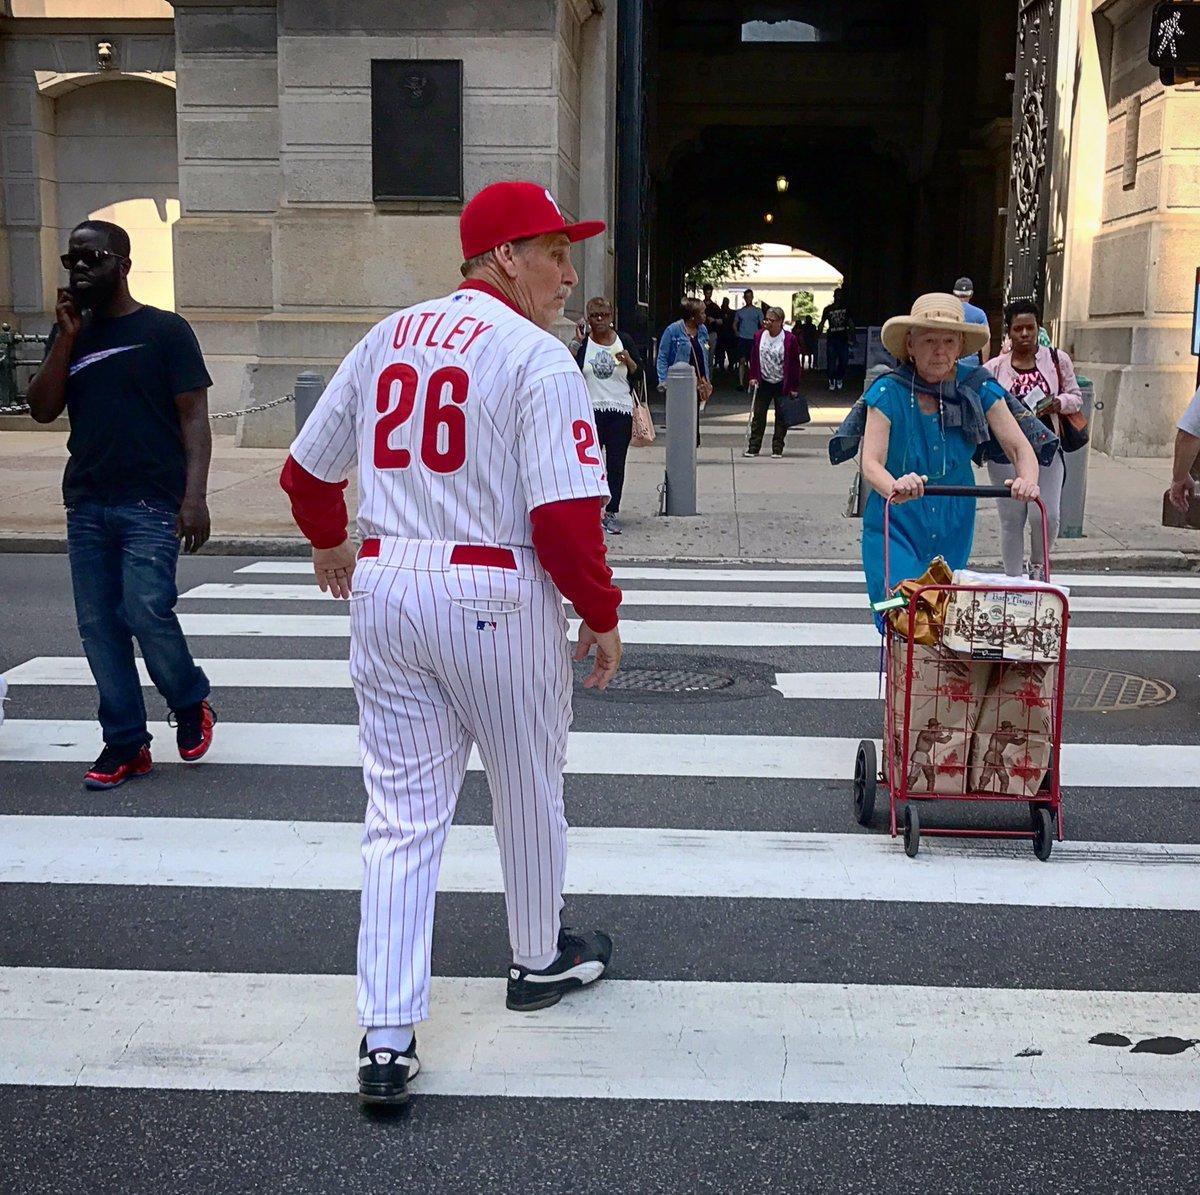 I just saw the ghost of baseball past near city hall: https://t.co/vtzSgaksqR